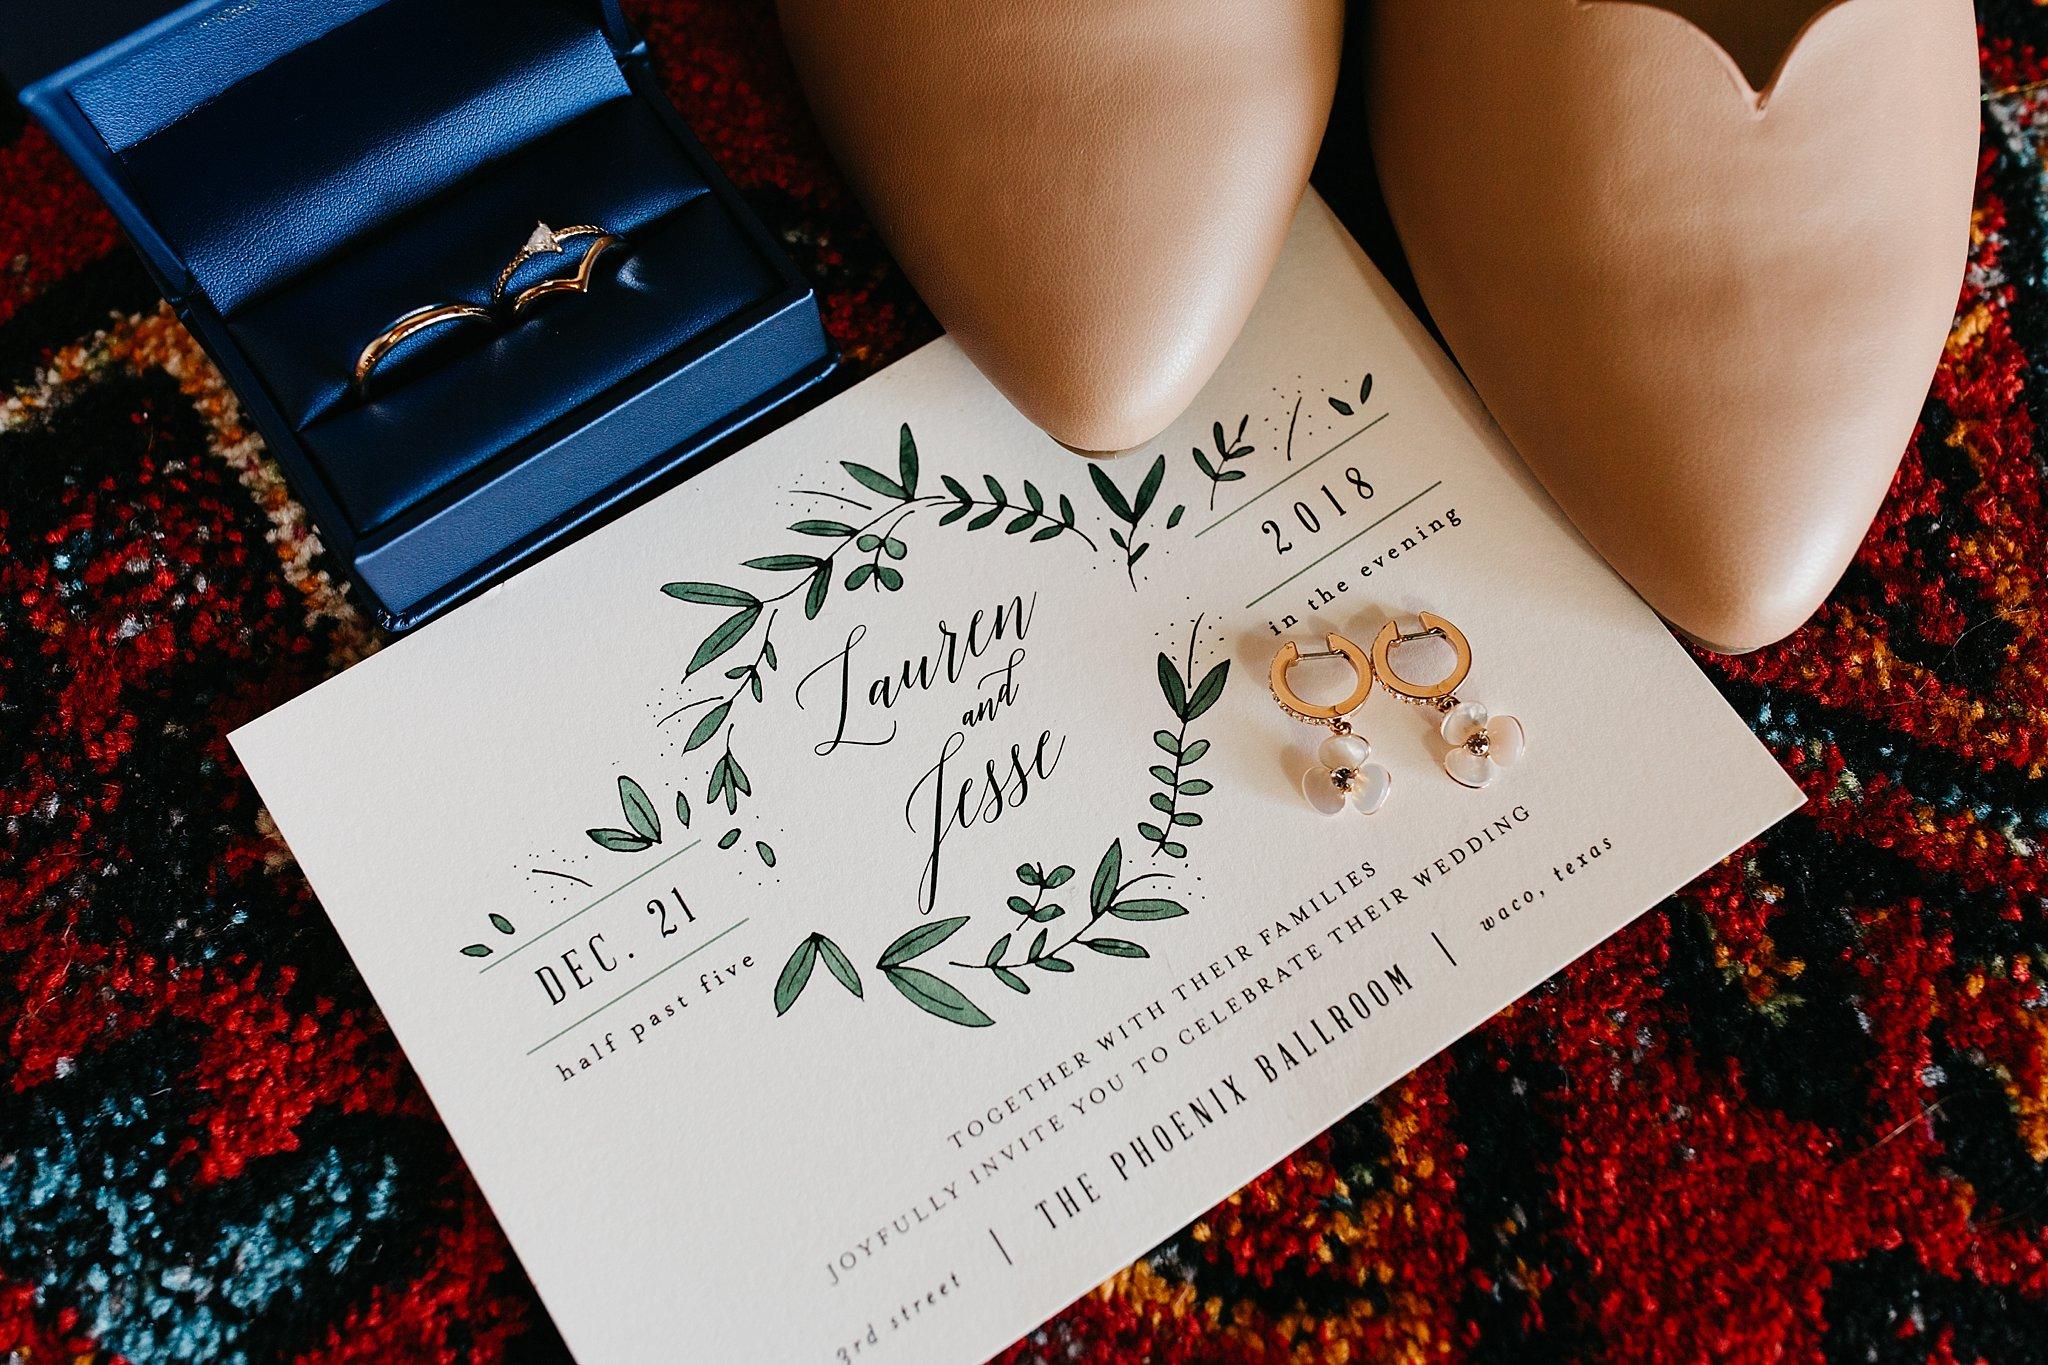 Wilderlove Co_Waco Texas_The Phoenix_Romantic Wedding Photography_0001.jpg